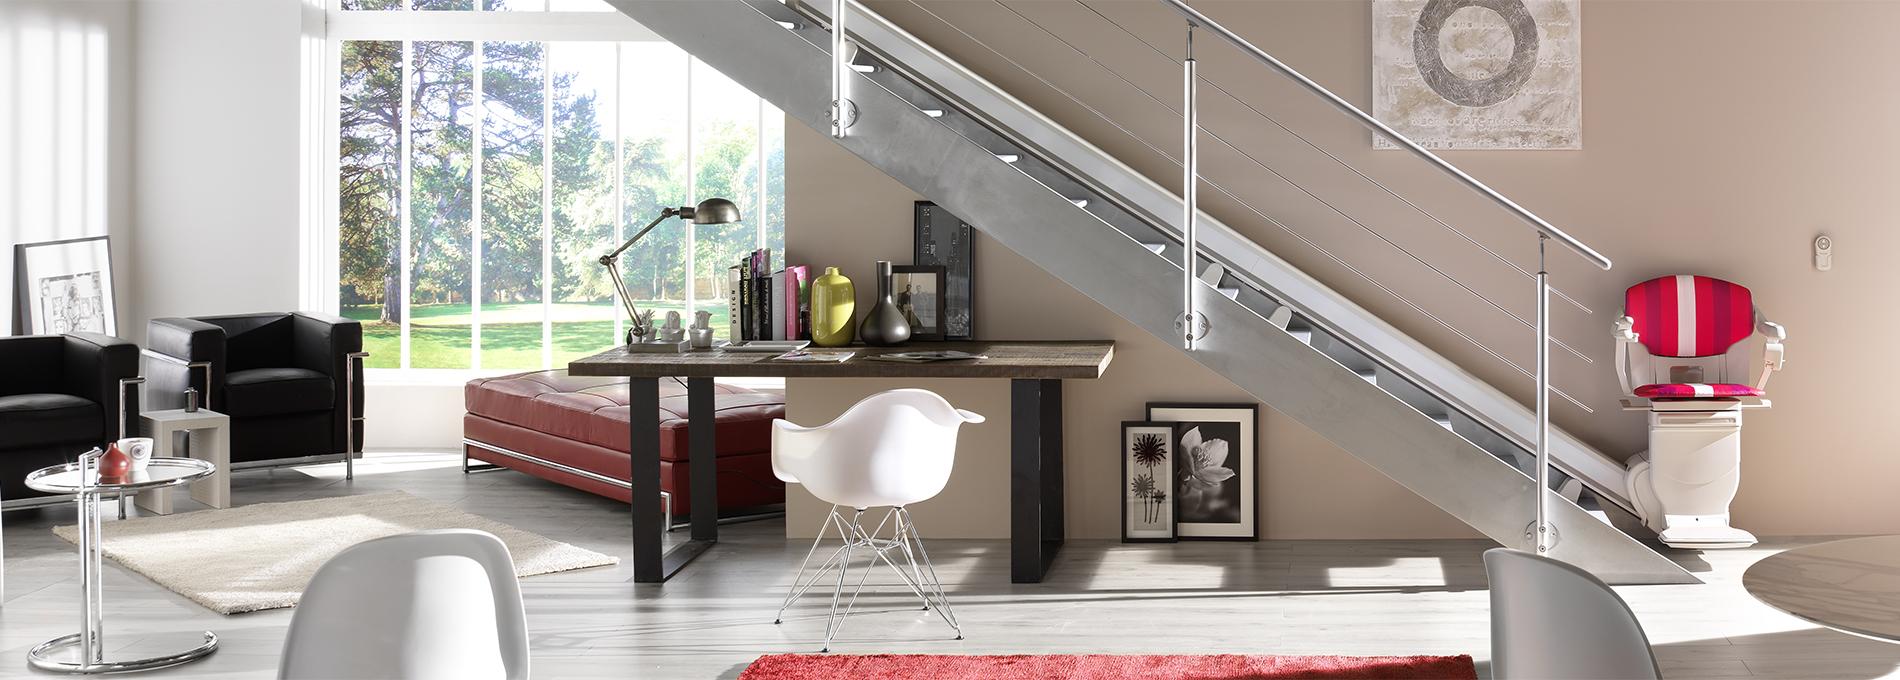 photo-decor-lyon-grand-studio-loft-monte-escalier